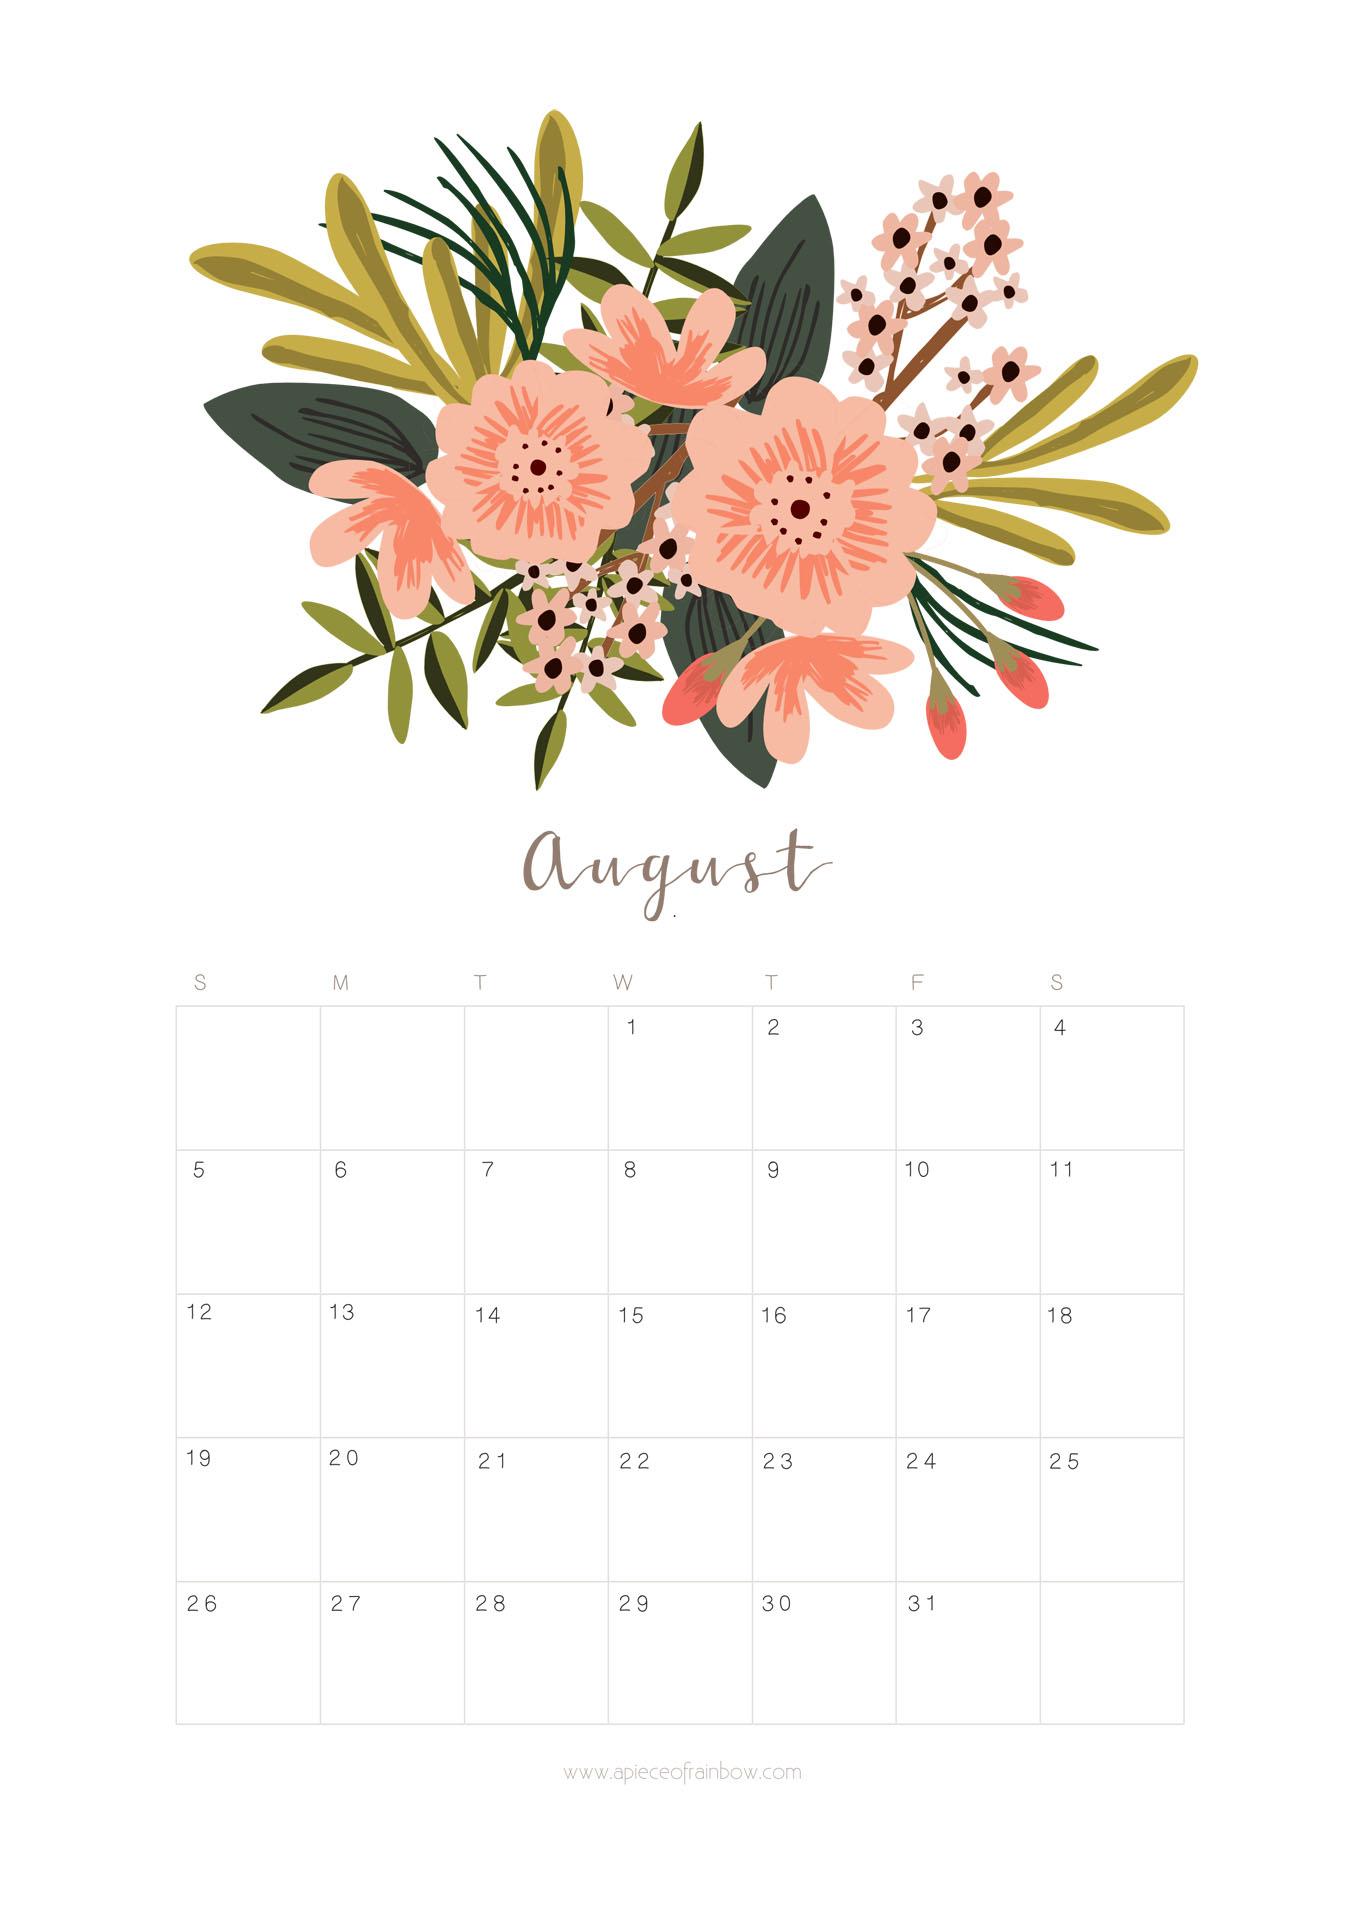 august calendars 2018